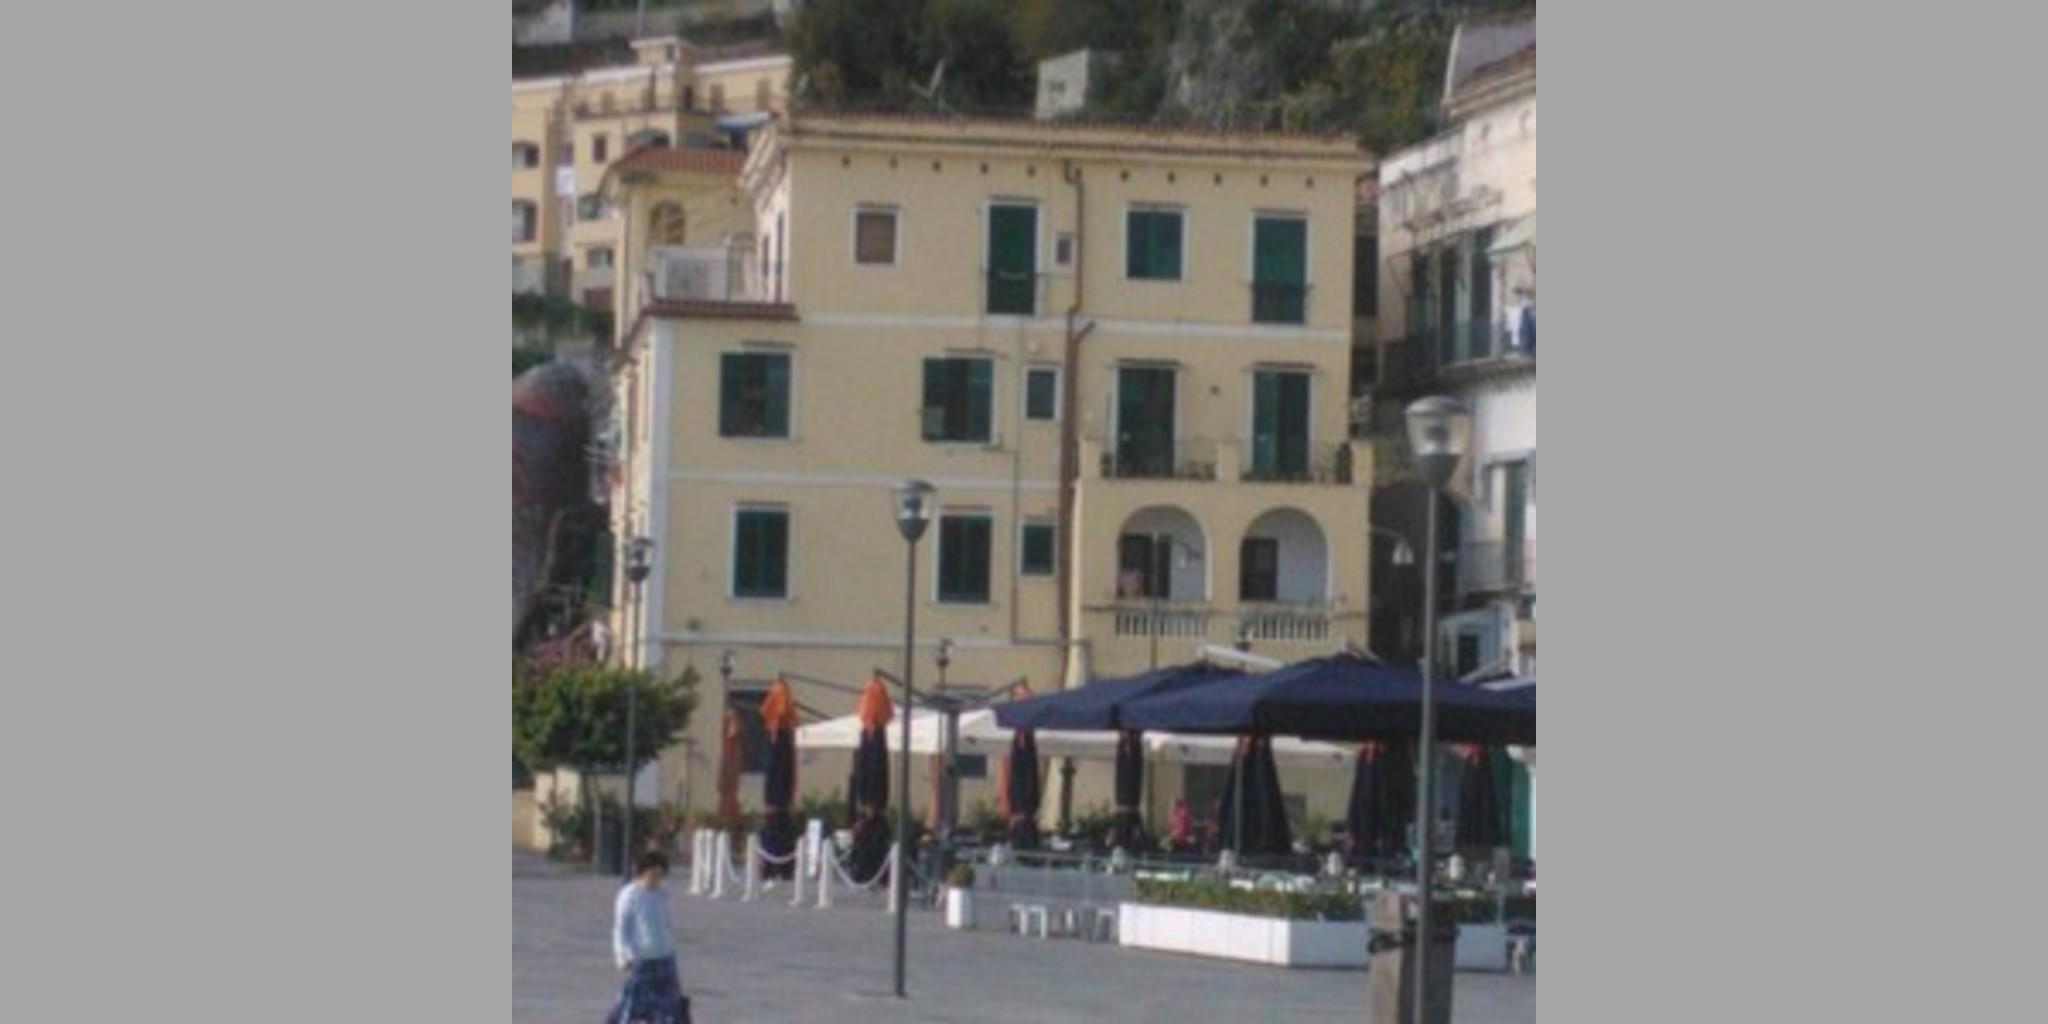 Appartement Vietri Sul Mare - Costiera Amalfitana_Vietri